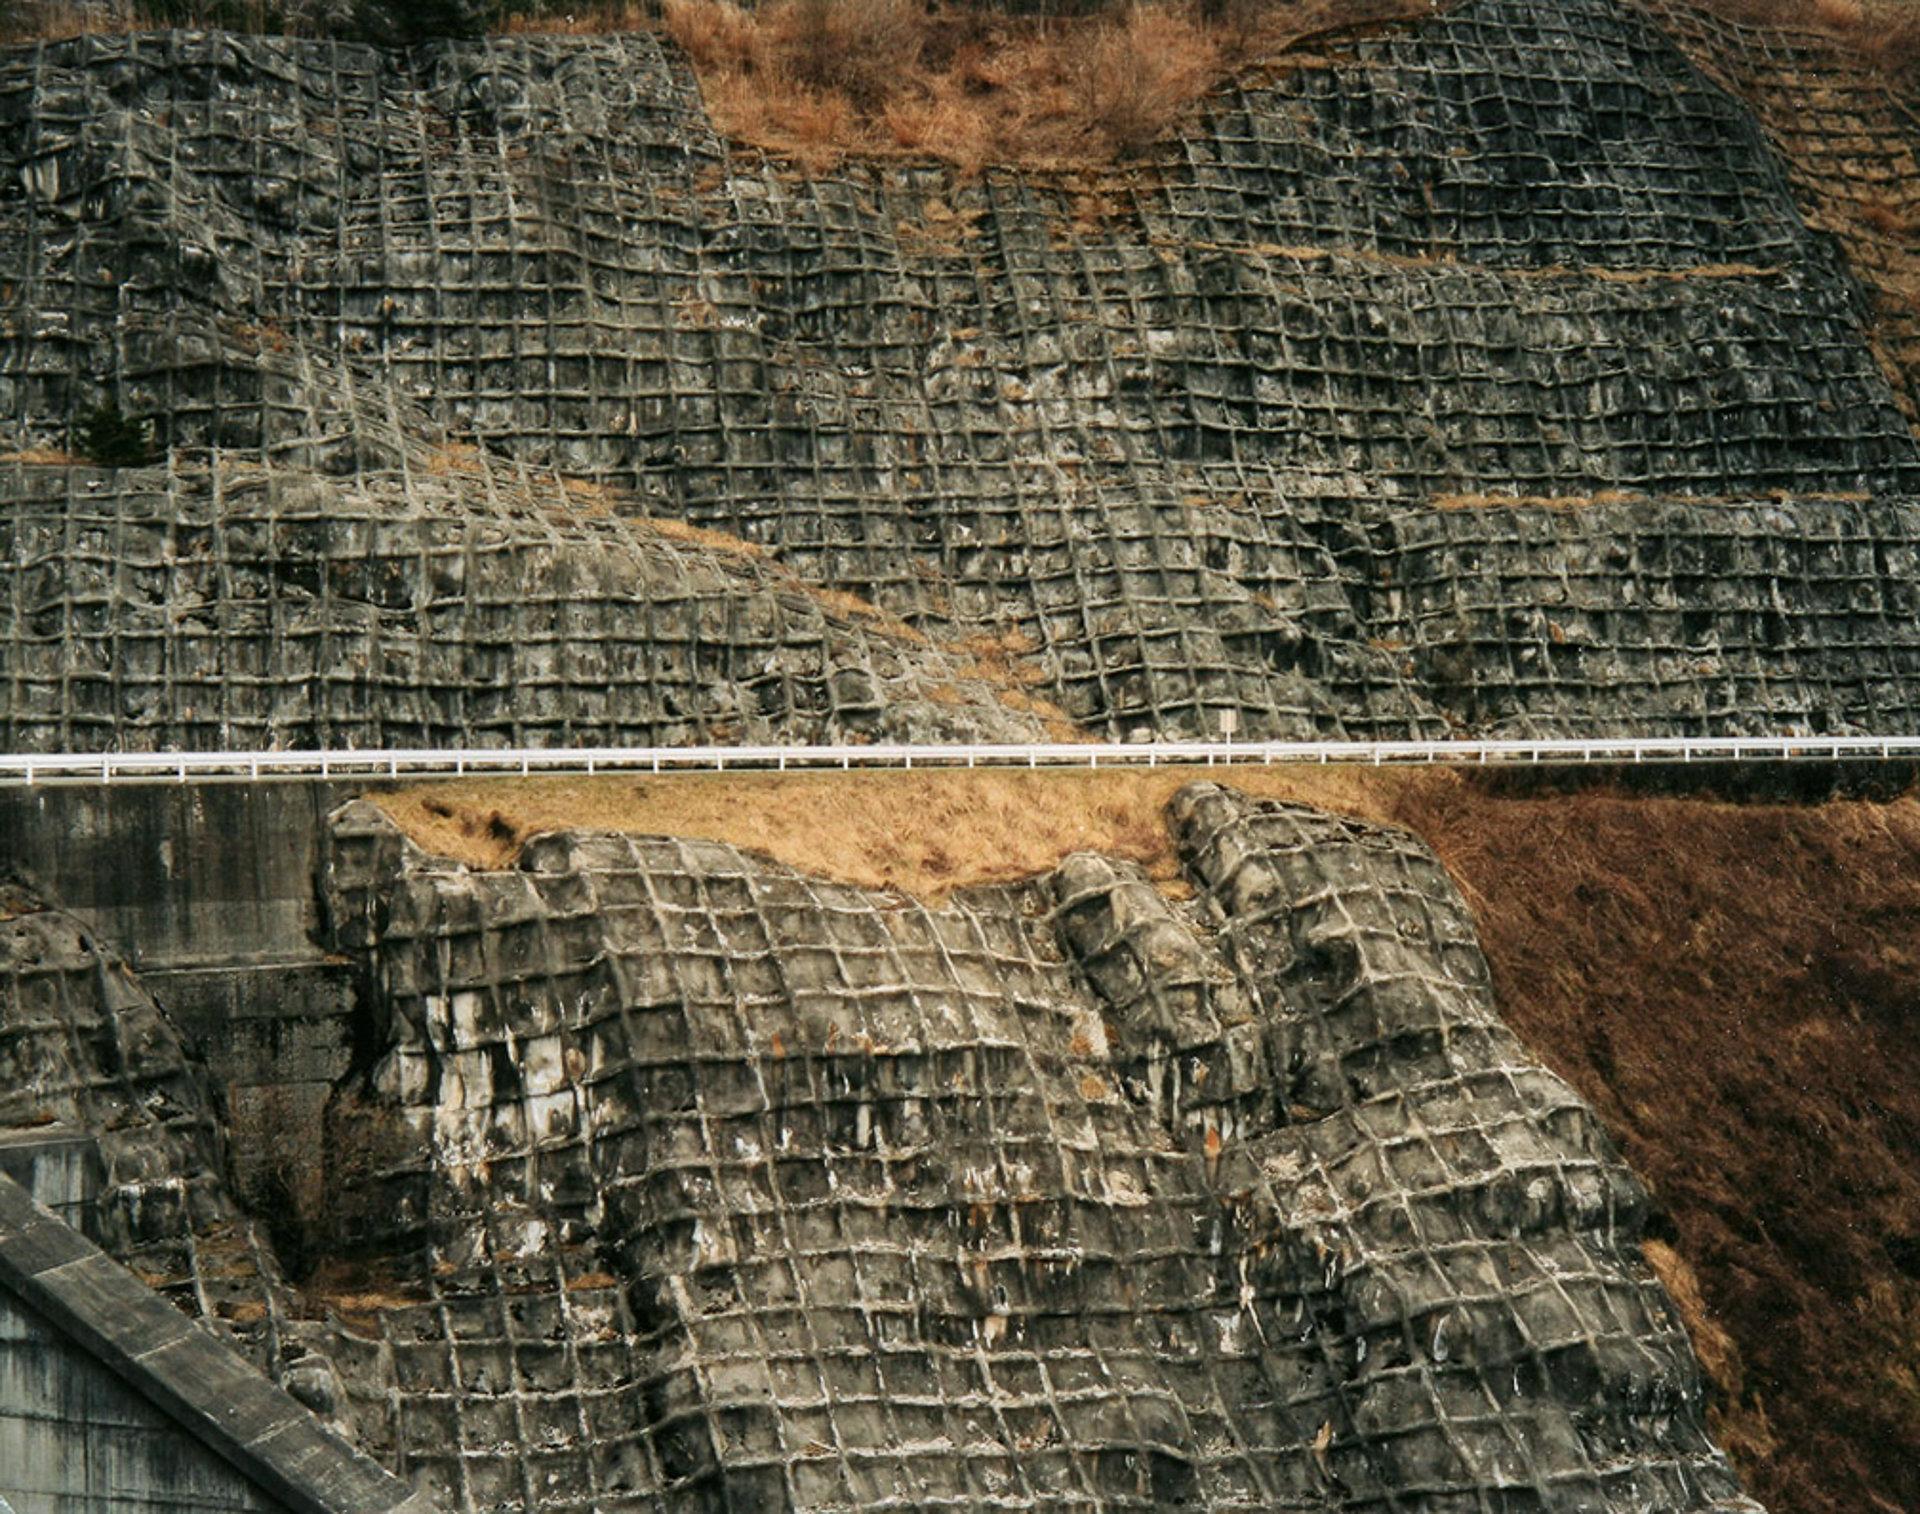 Toshio Shibata: Landscapes